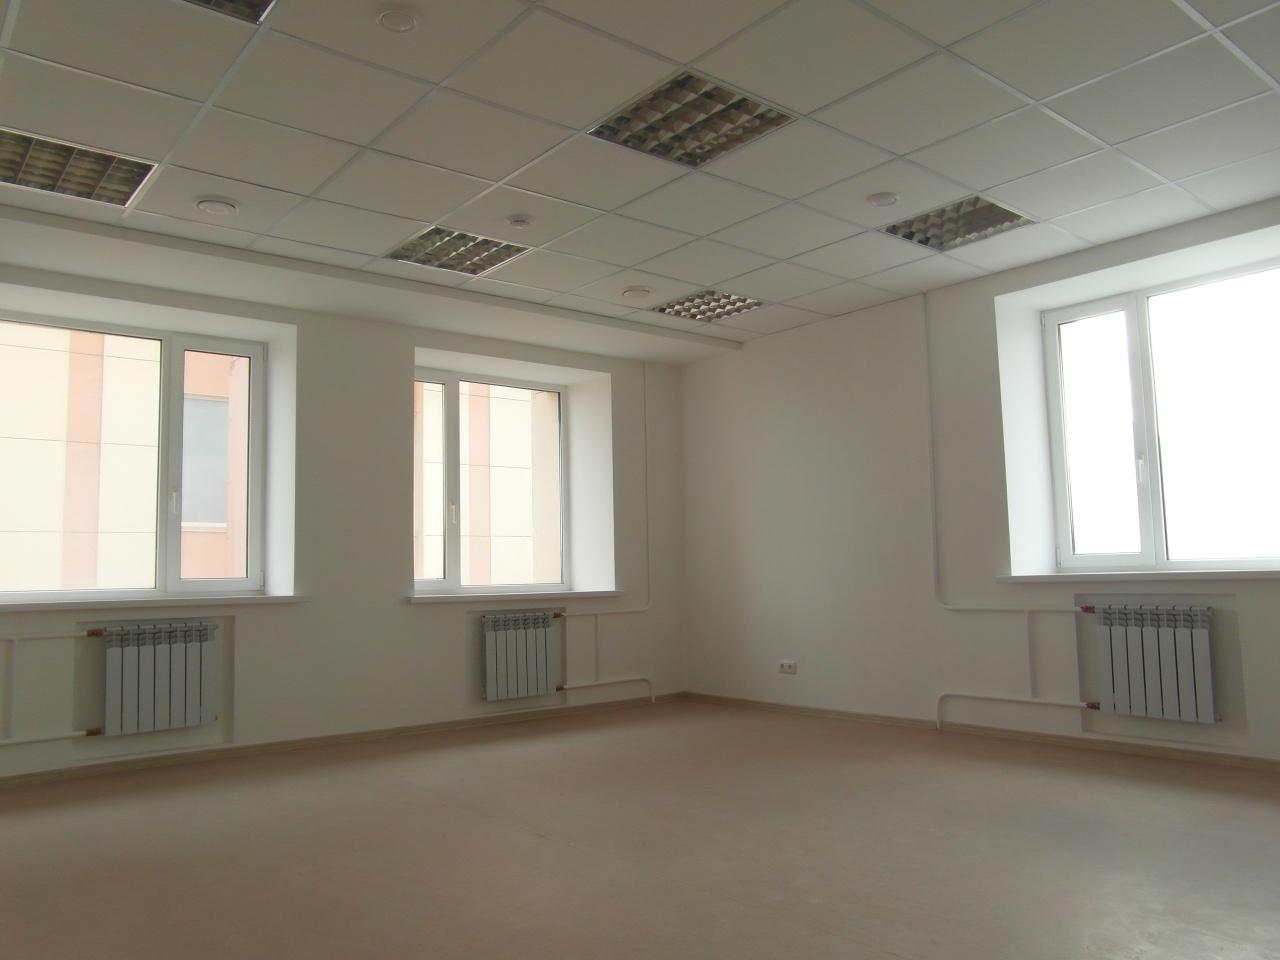 Аренда офиса, помещения под офис пл. Петра Великого, -